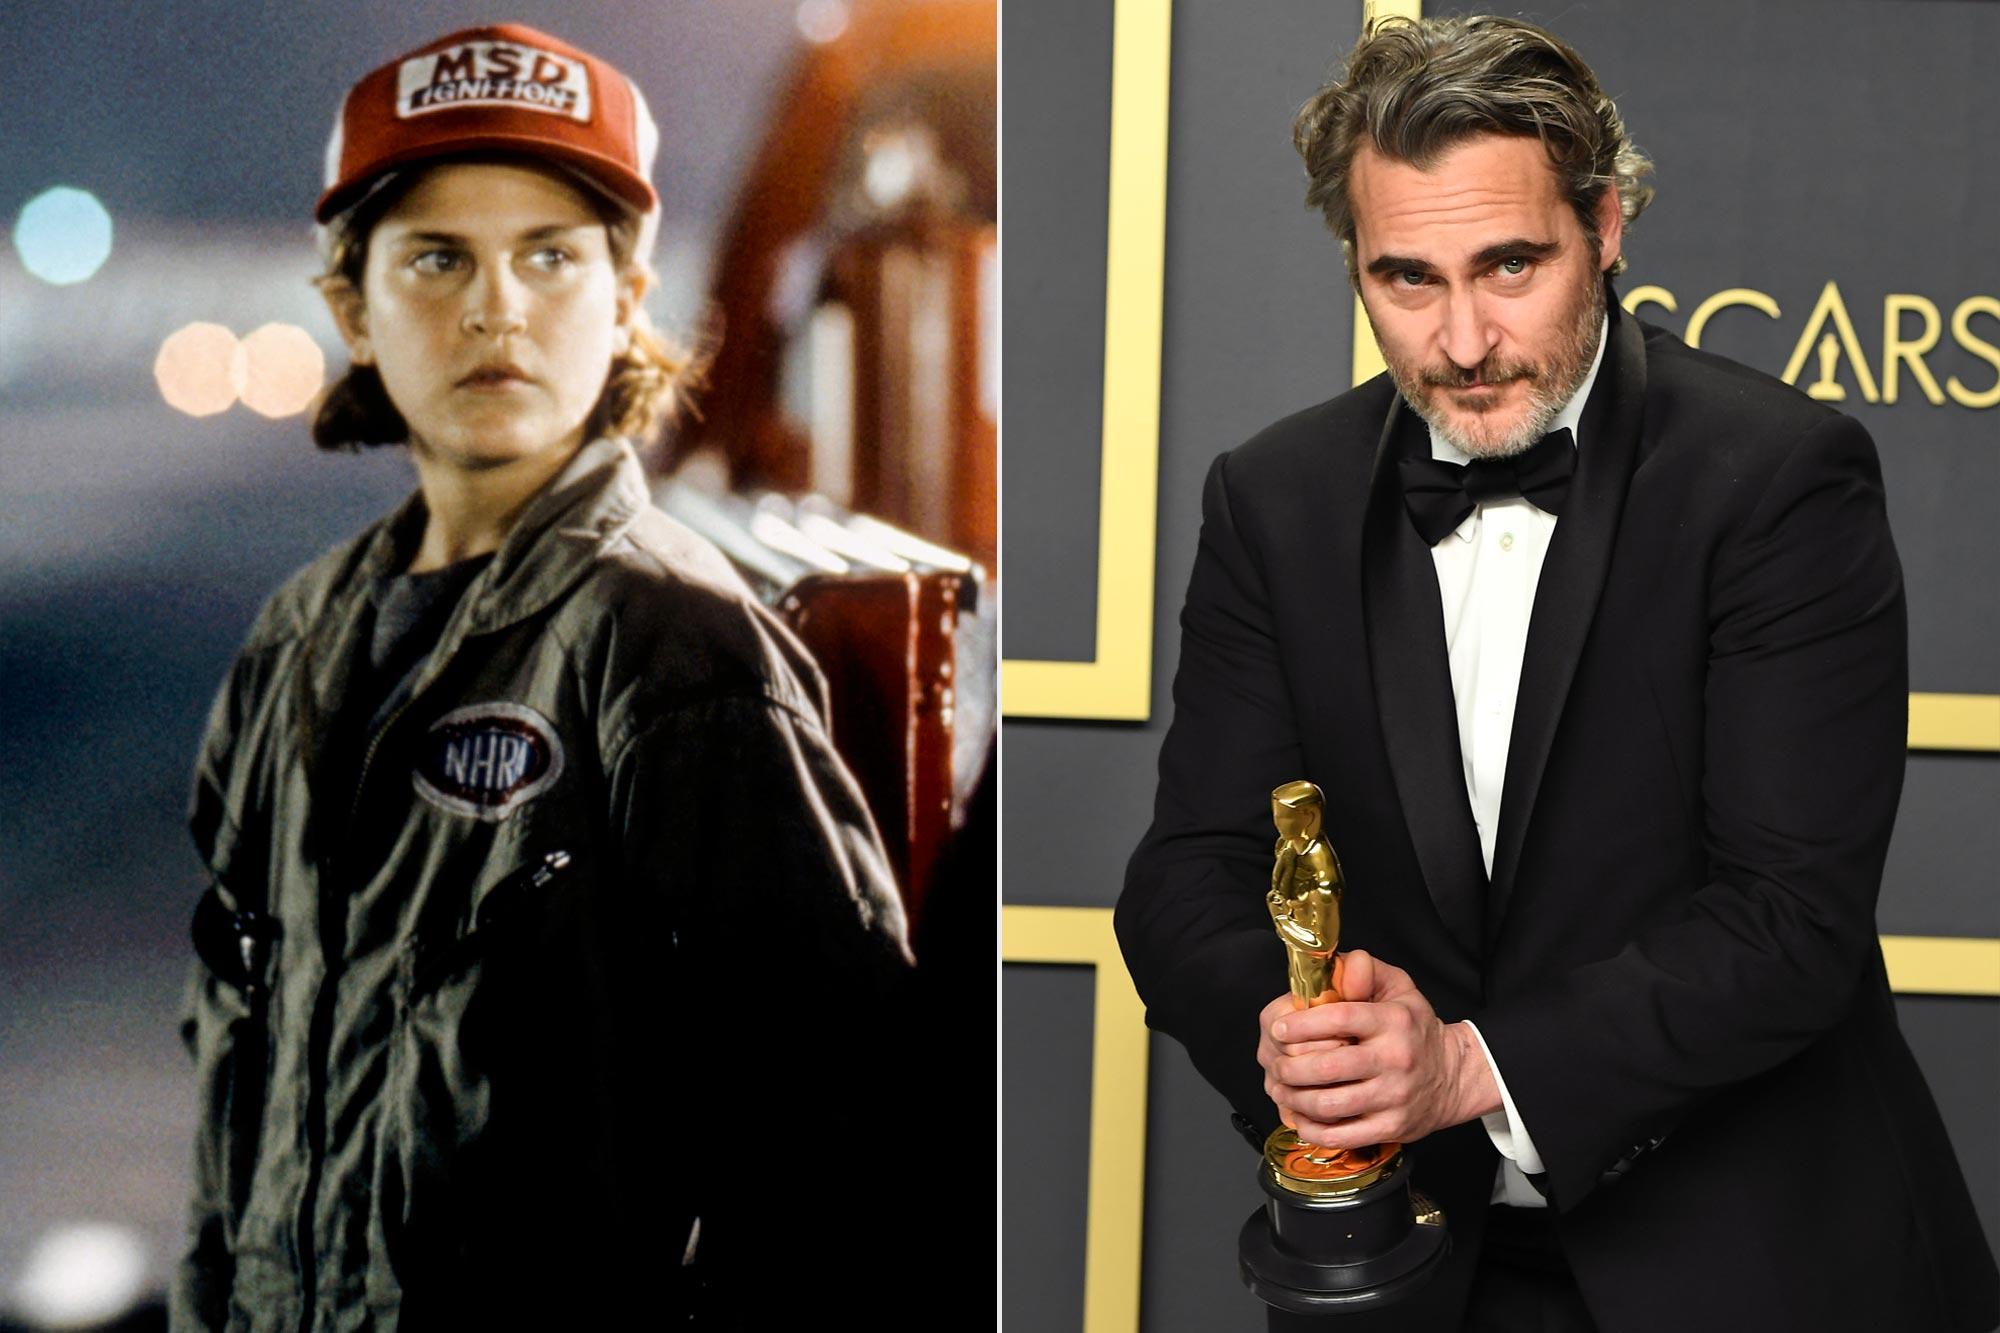 Oscar Winners who were child stars